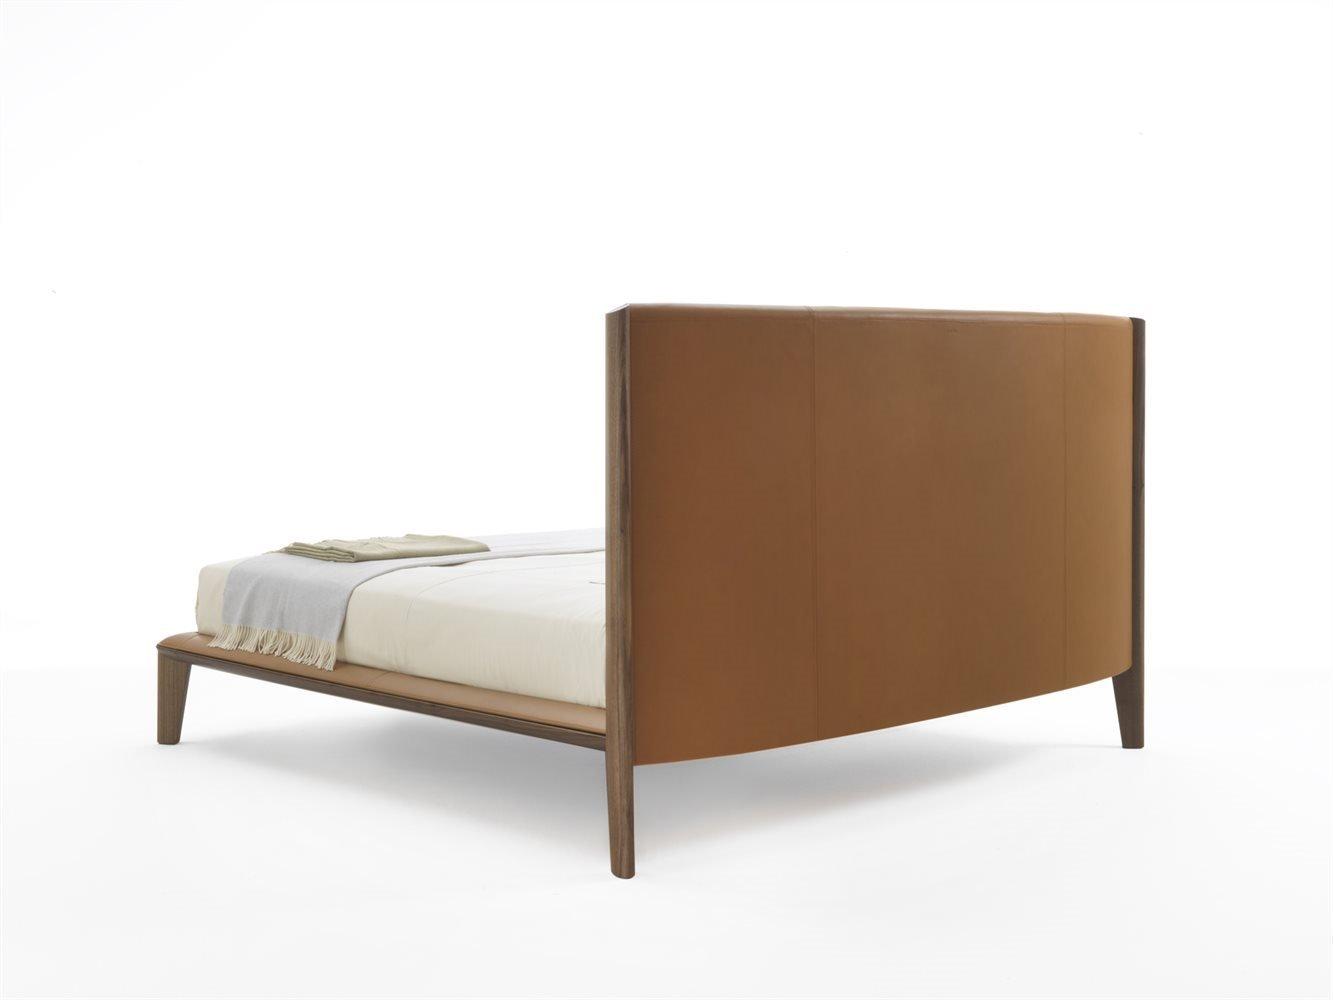 Nyan Bed from Porada, designed by Gabriele & Oscar Buratti